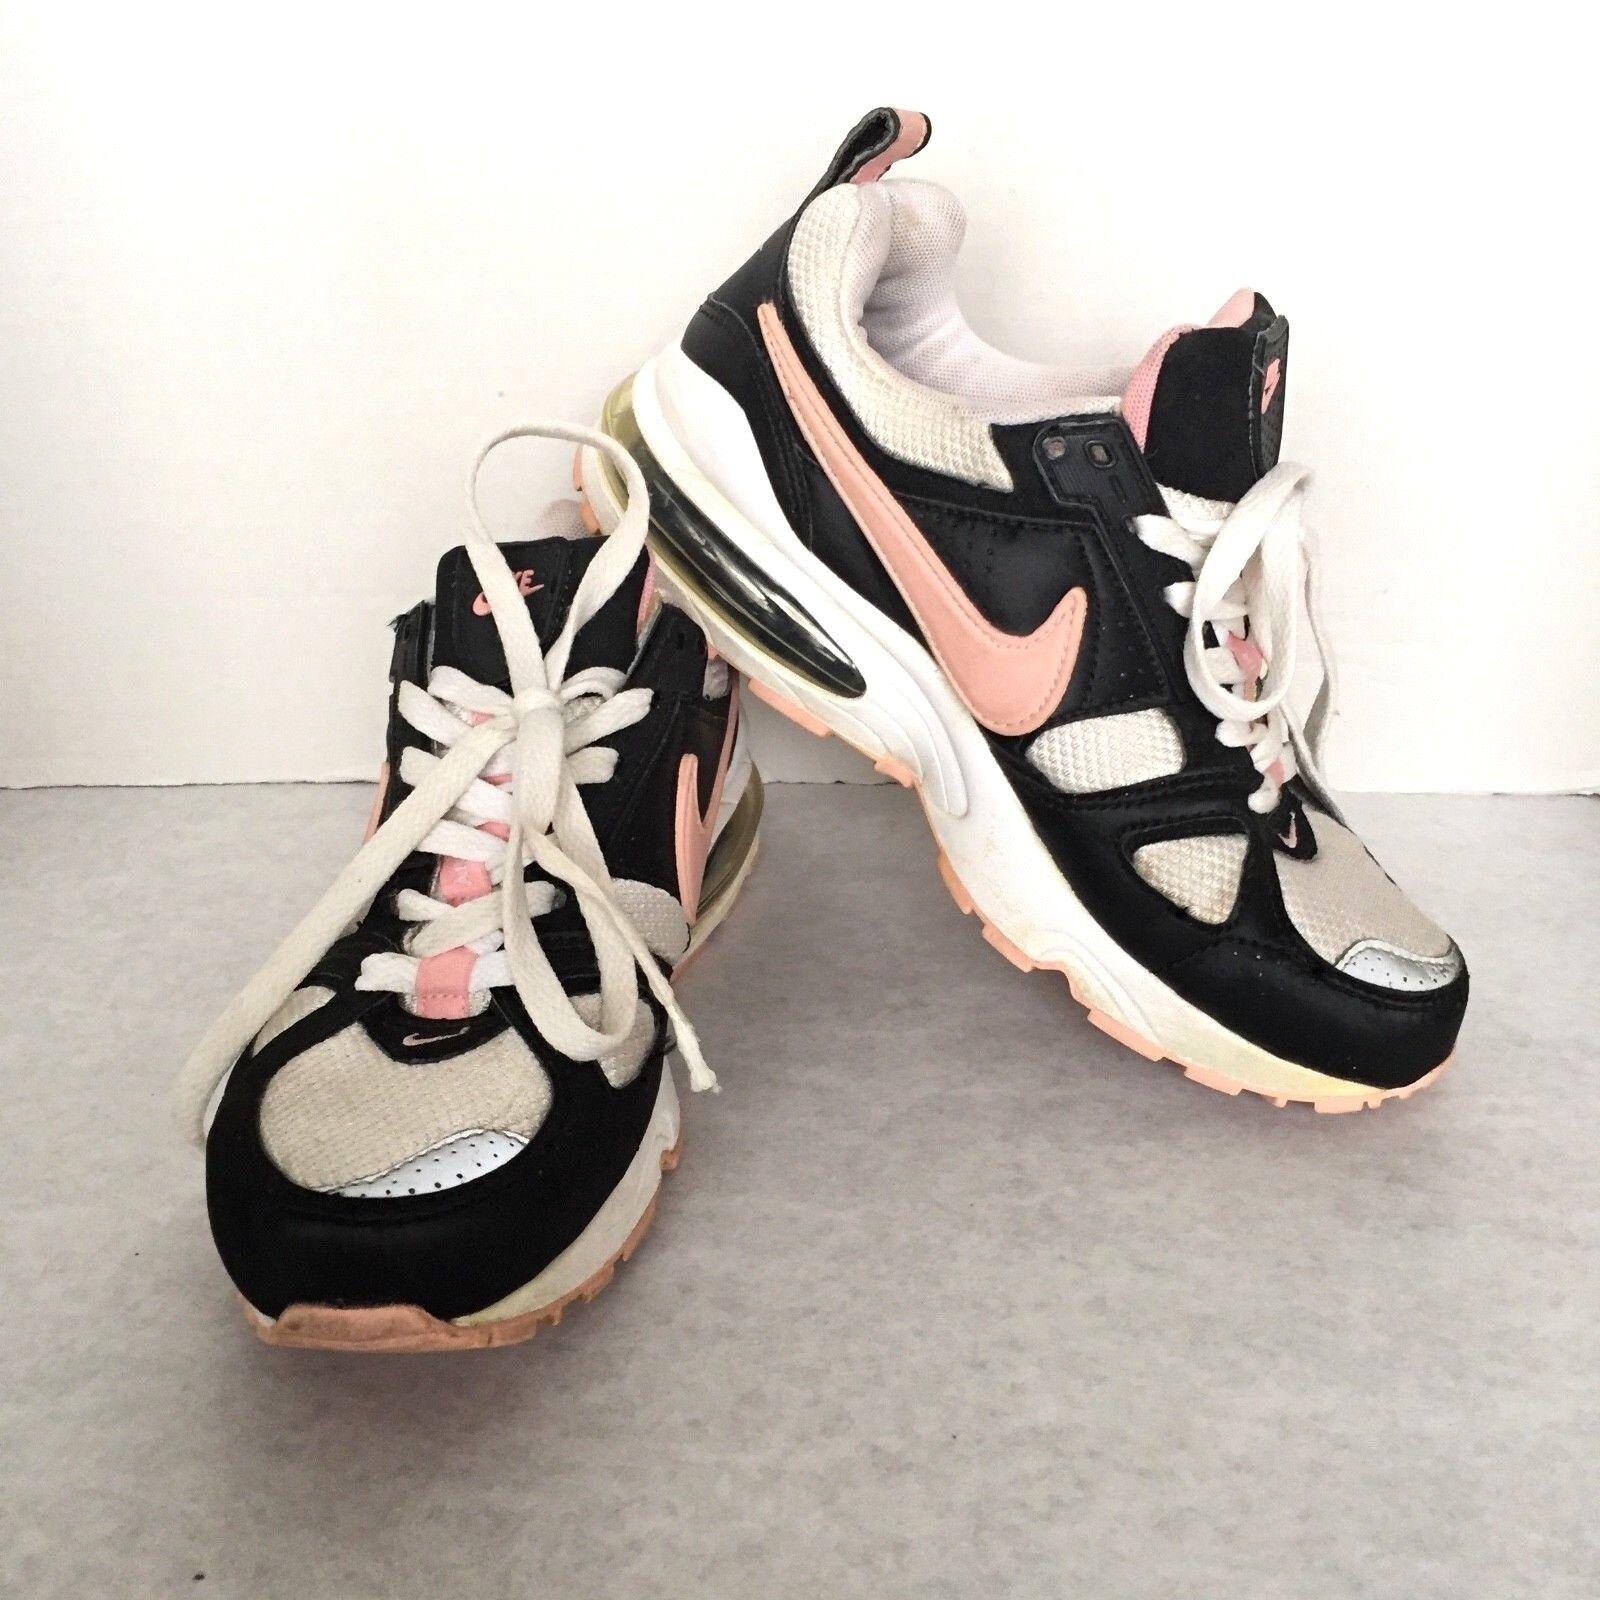 Le maglie nike air max nero rosa bianca in scarpe 7 m